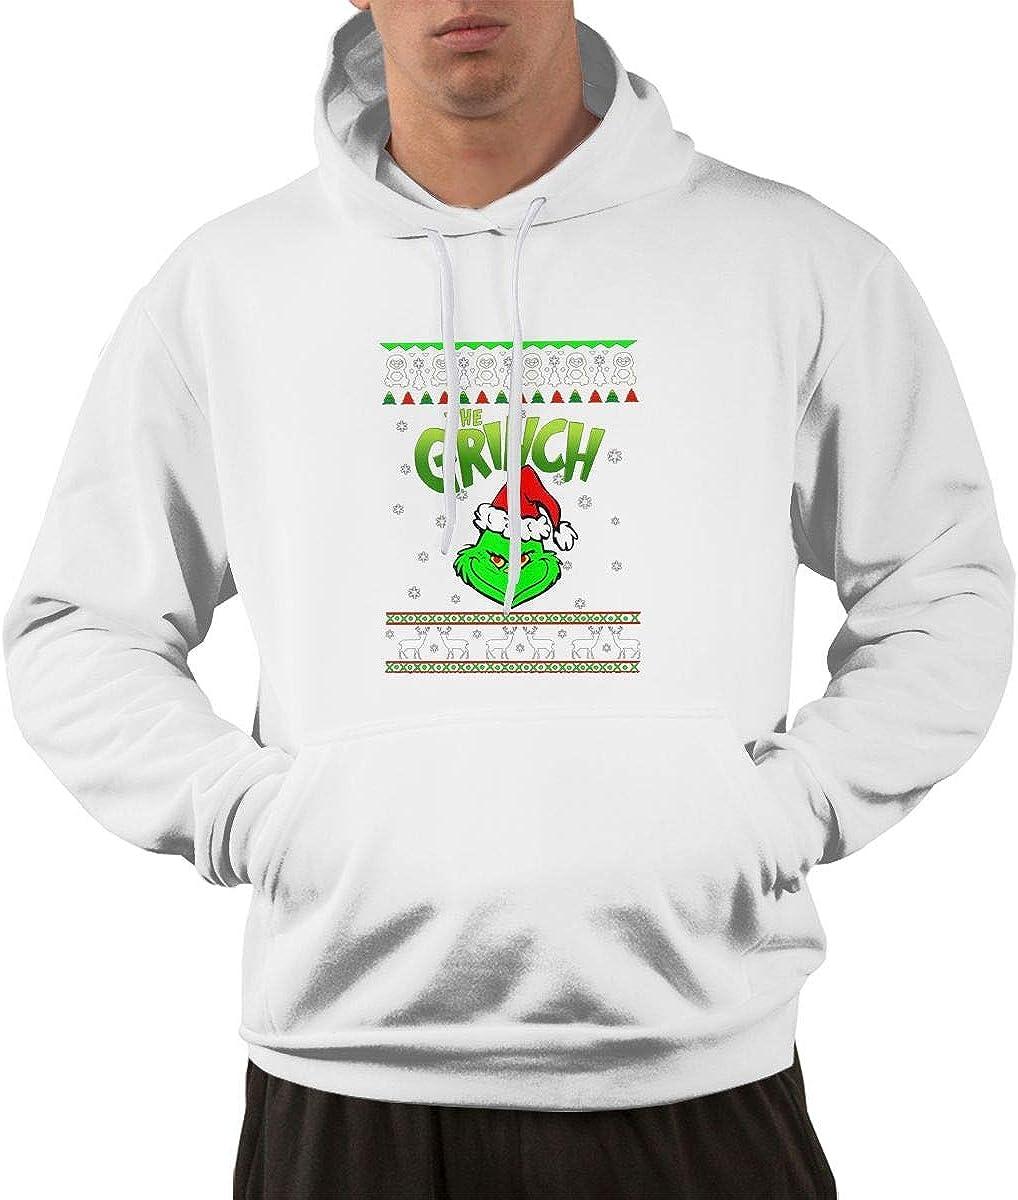 Hooded Sweater Sweatshirt for Men 14 Wokeyia Black Wild The Grinch